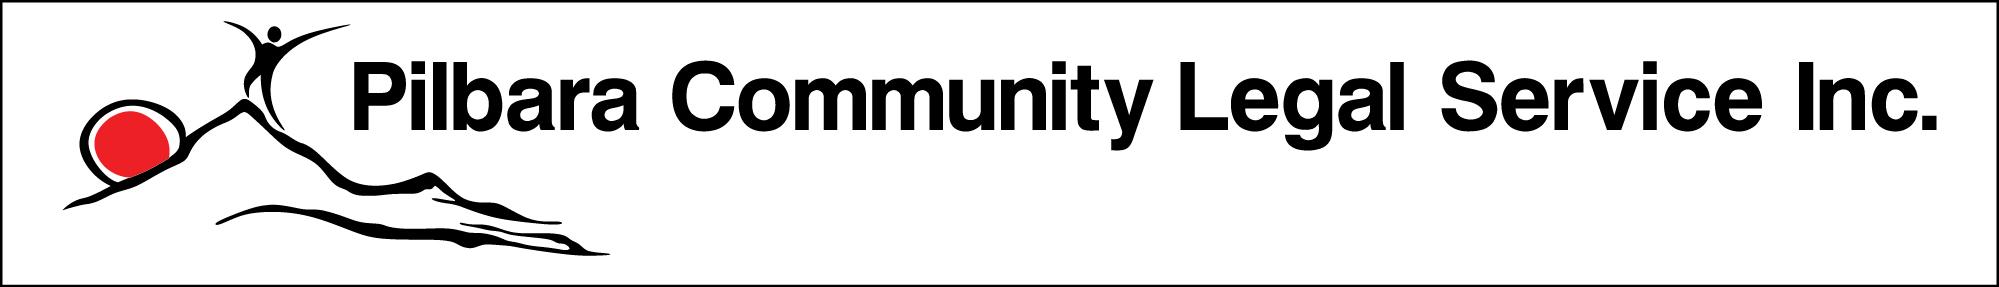 Pilbara Community Legal Service Inc.